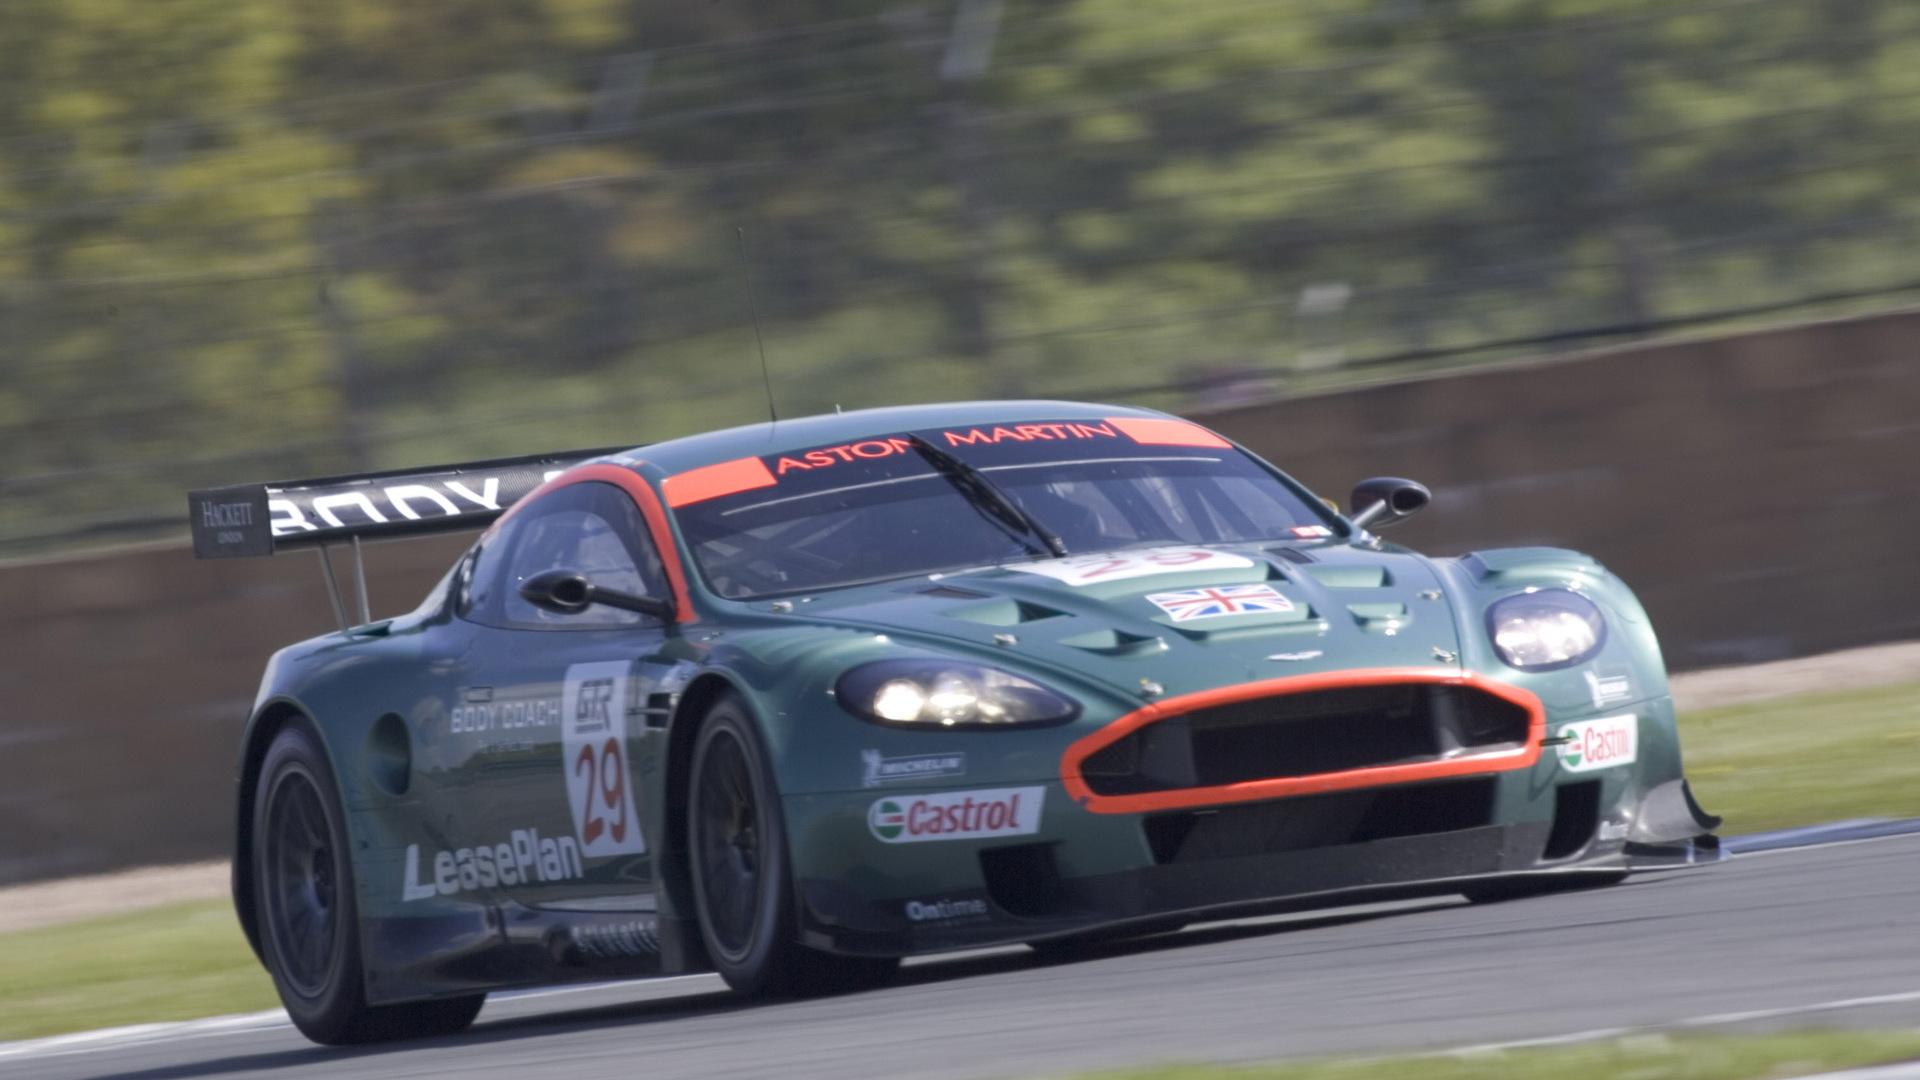 Aston Martin DBR9 race car built by Prodrive